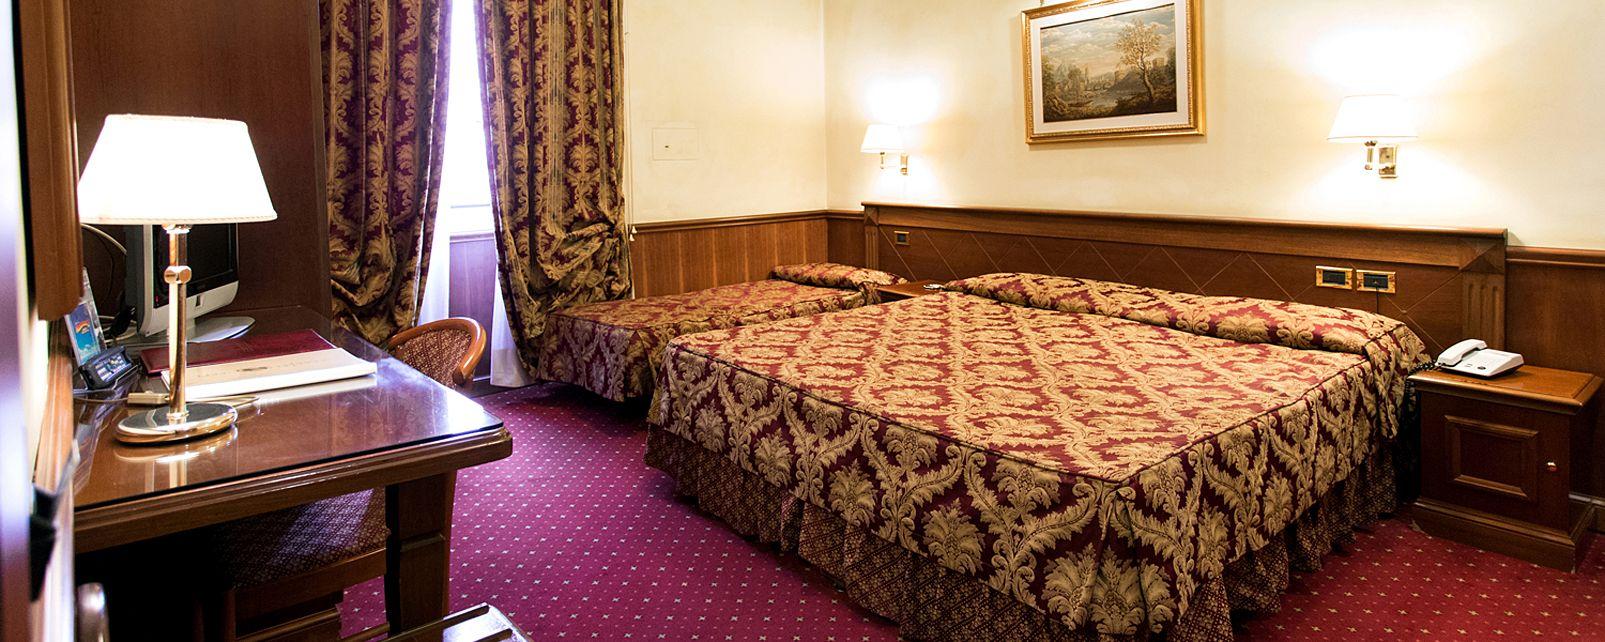 Hotel Palladium Palace Hotel Rome